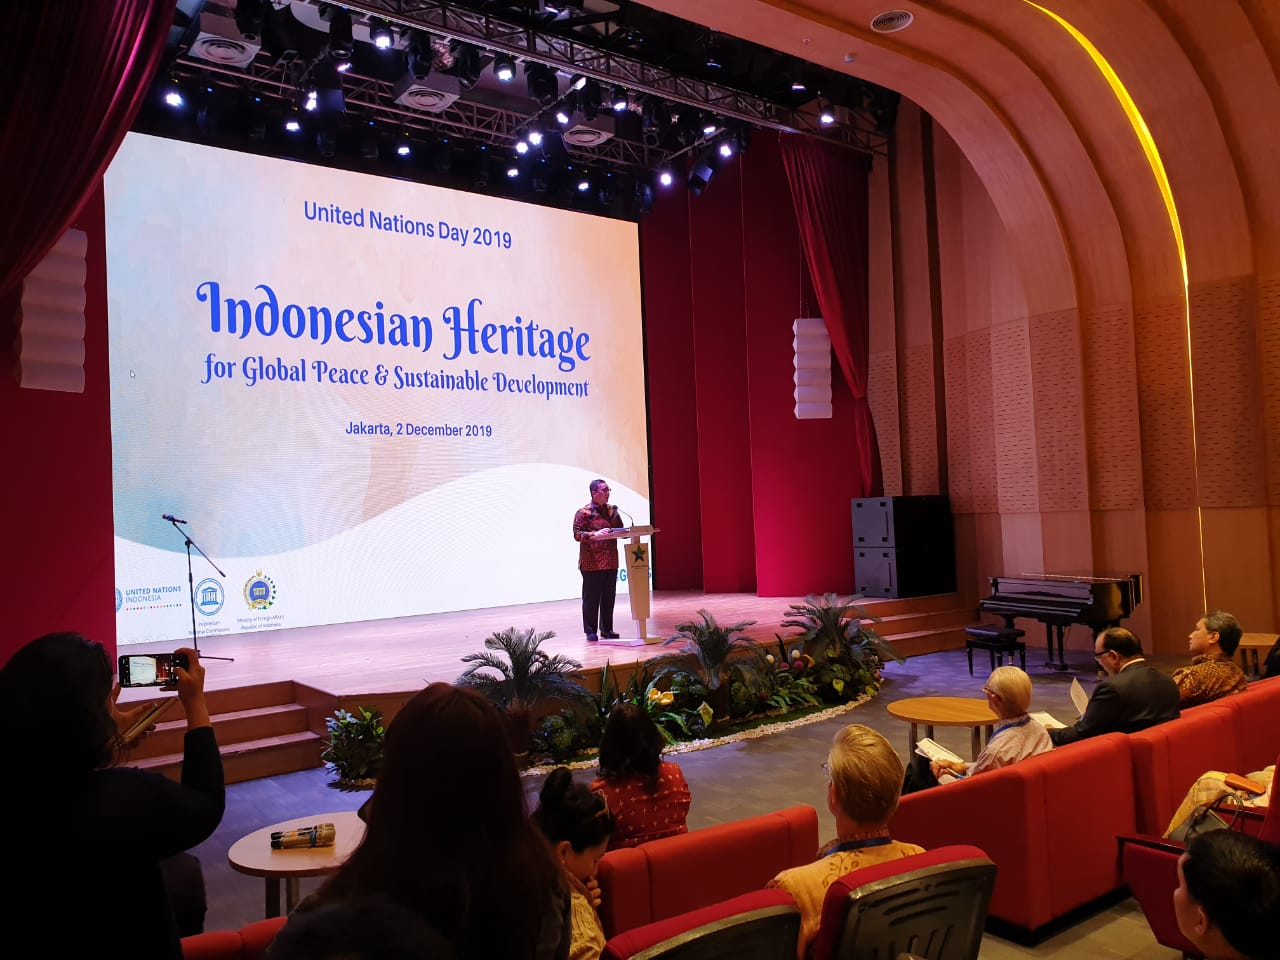 Kementerian Luar Negeri bekerja sama dengan Komisi Nasional Indonesia untuk UNESCO (KNIU), UN Resident Coordinator Office (UNRCO), serta UNESCO Indonesia menyelenggarakan kegiatan UN Day 2019 yang pada 2 Desember 2019 di Perpustakaan Nasional, Jakarta.